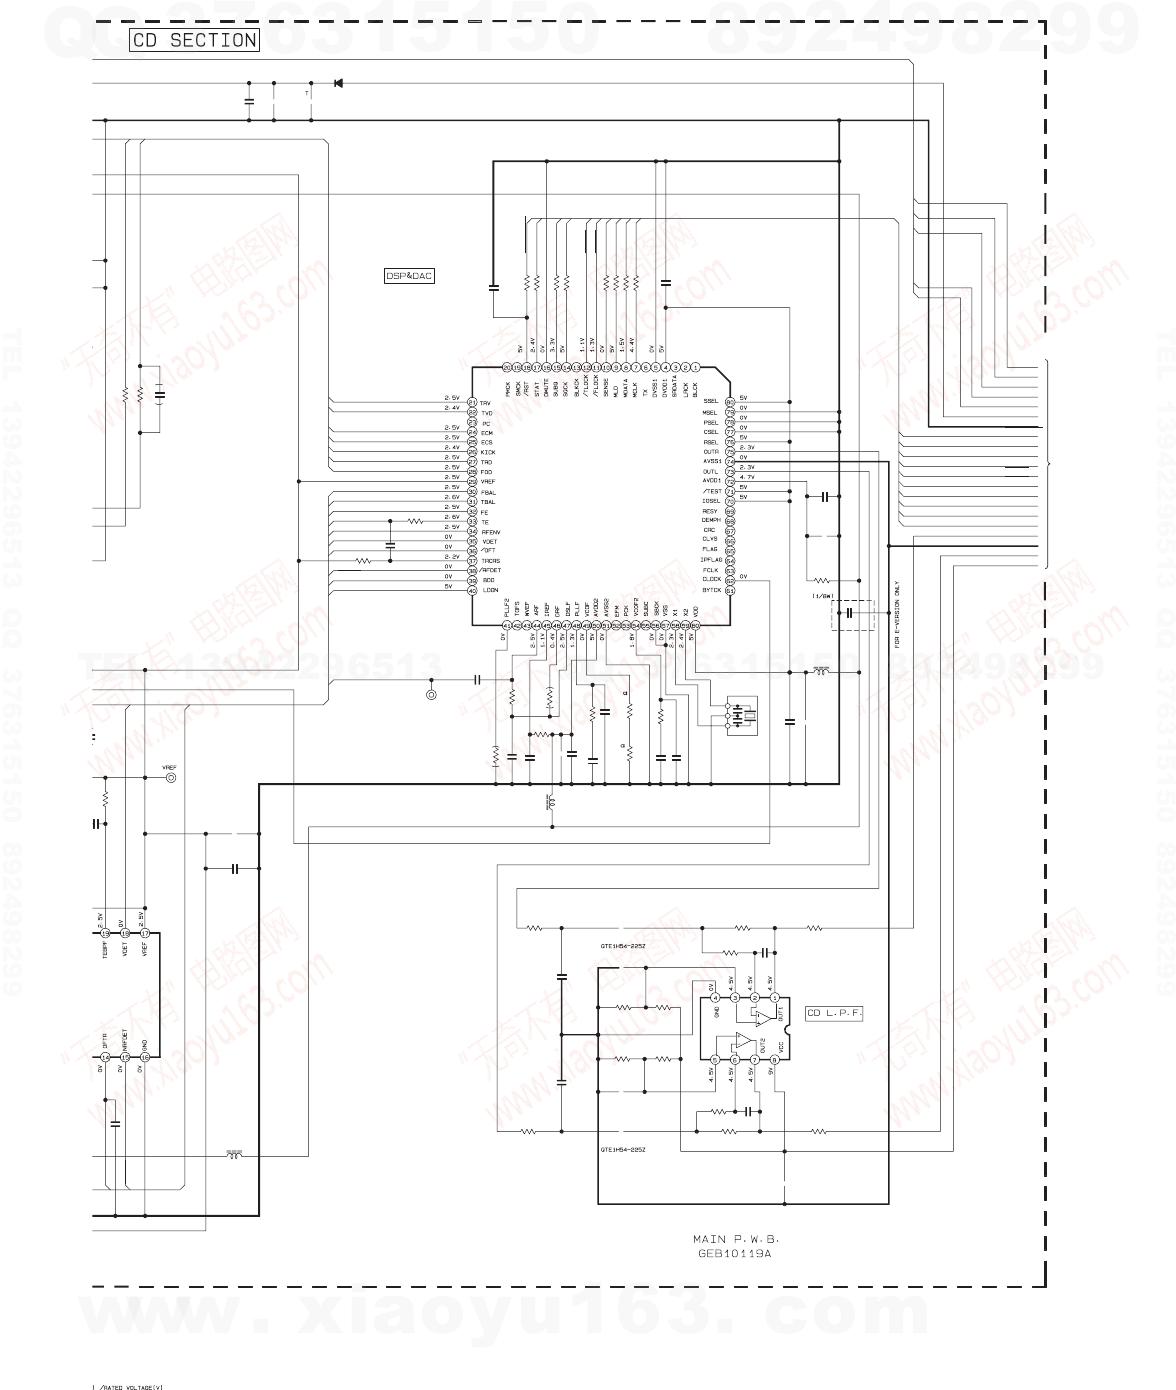 Ma121 Kd S11 2013070449 Jvc G110 Wiring Diagram 2 6